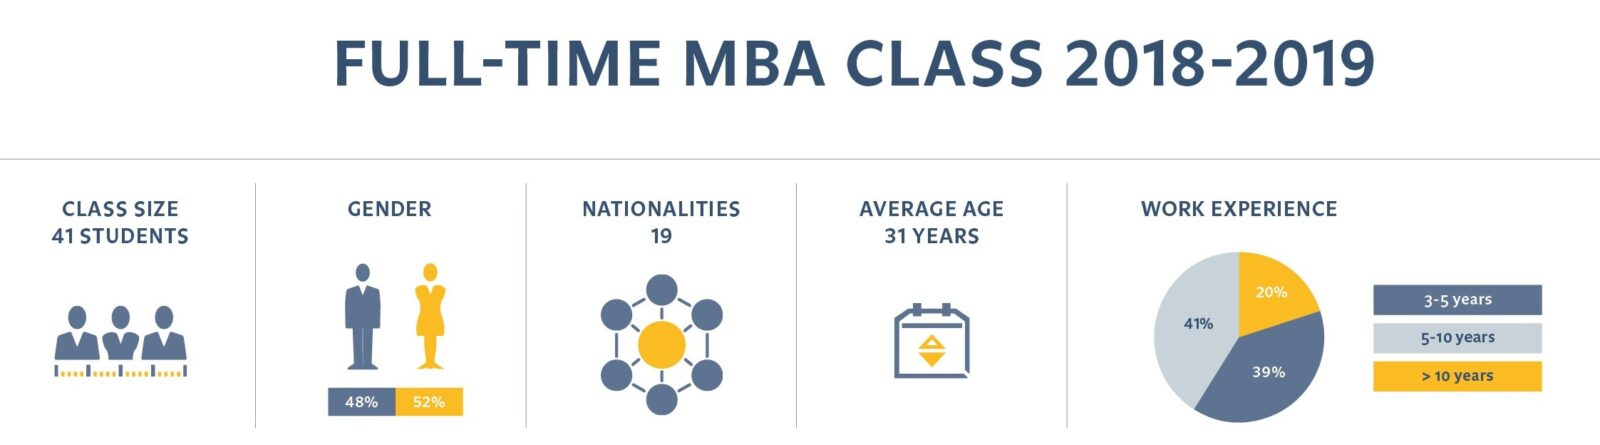 Рынок MBA в 2019 году – 5 трендов